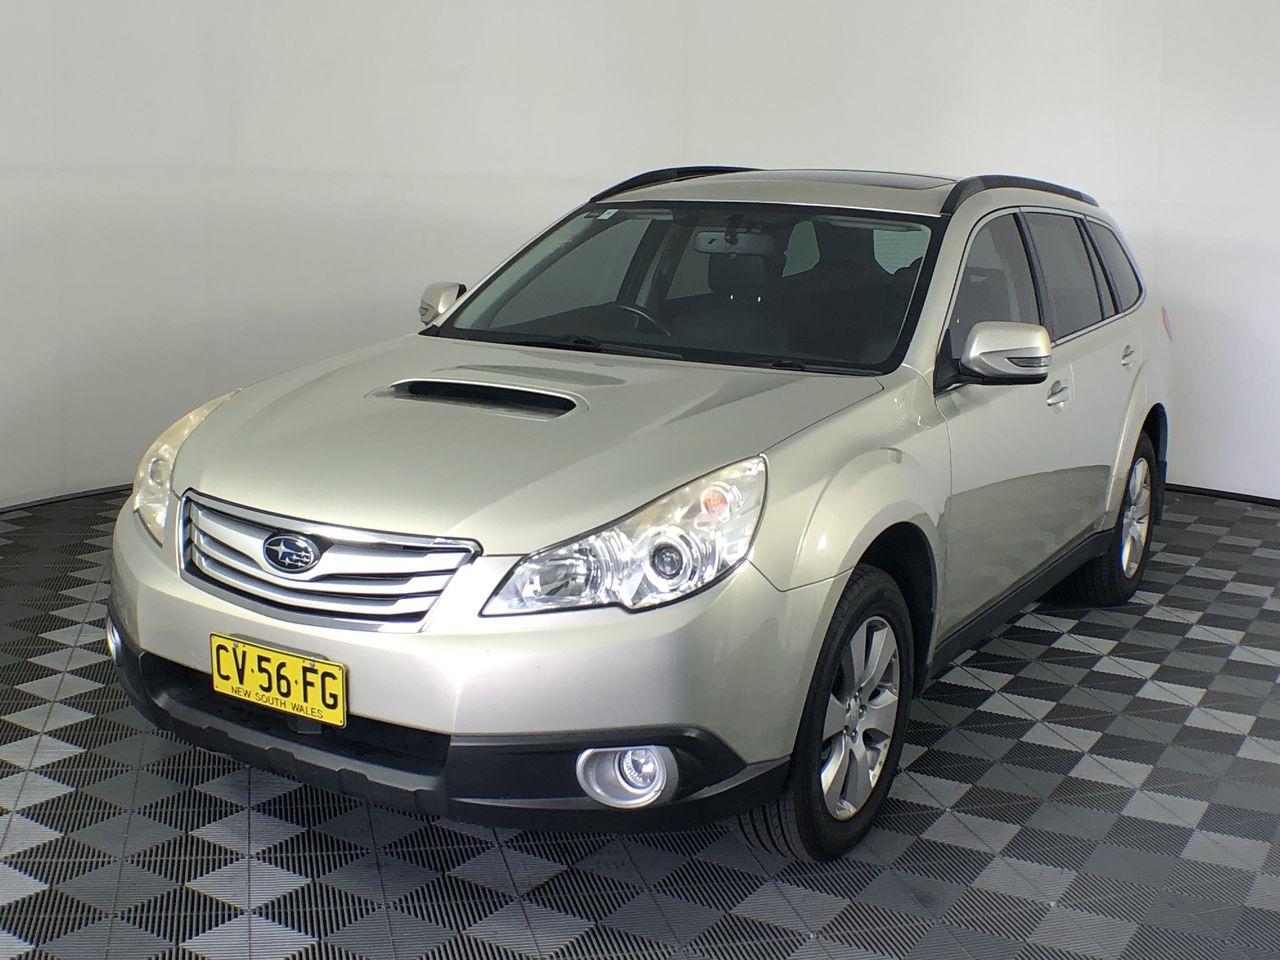 2010 Subaru Outback 2.0D Premium B5A Turbo Diesel Manual Wagon